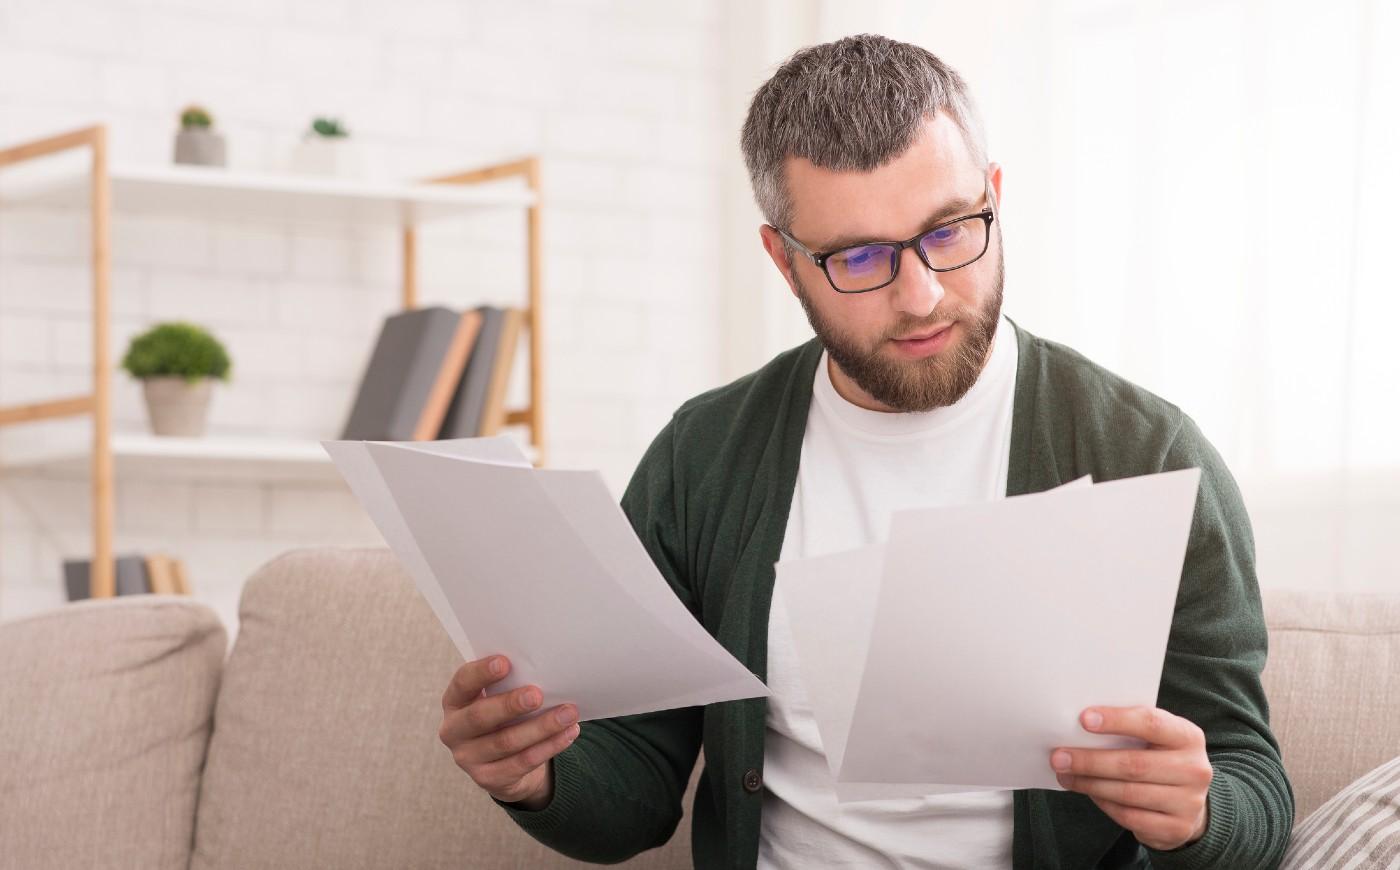 A man making sense of insurance words.